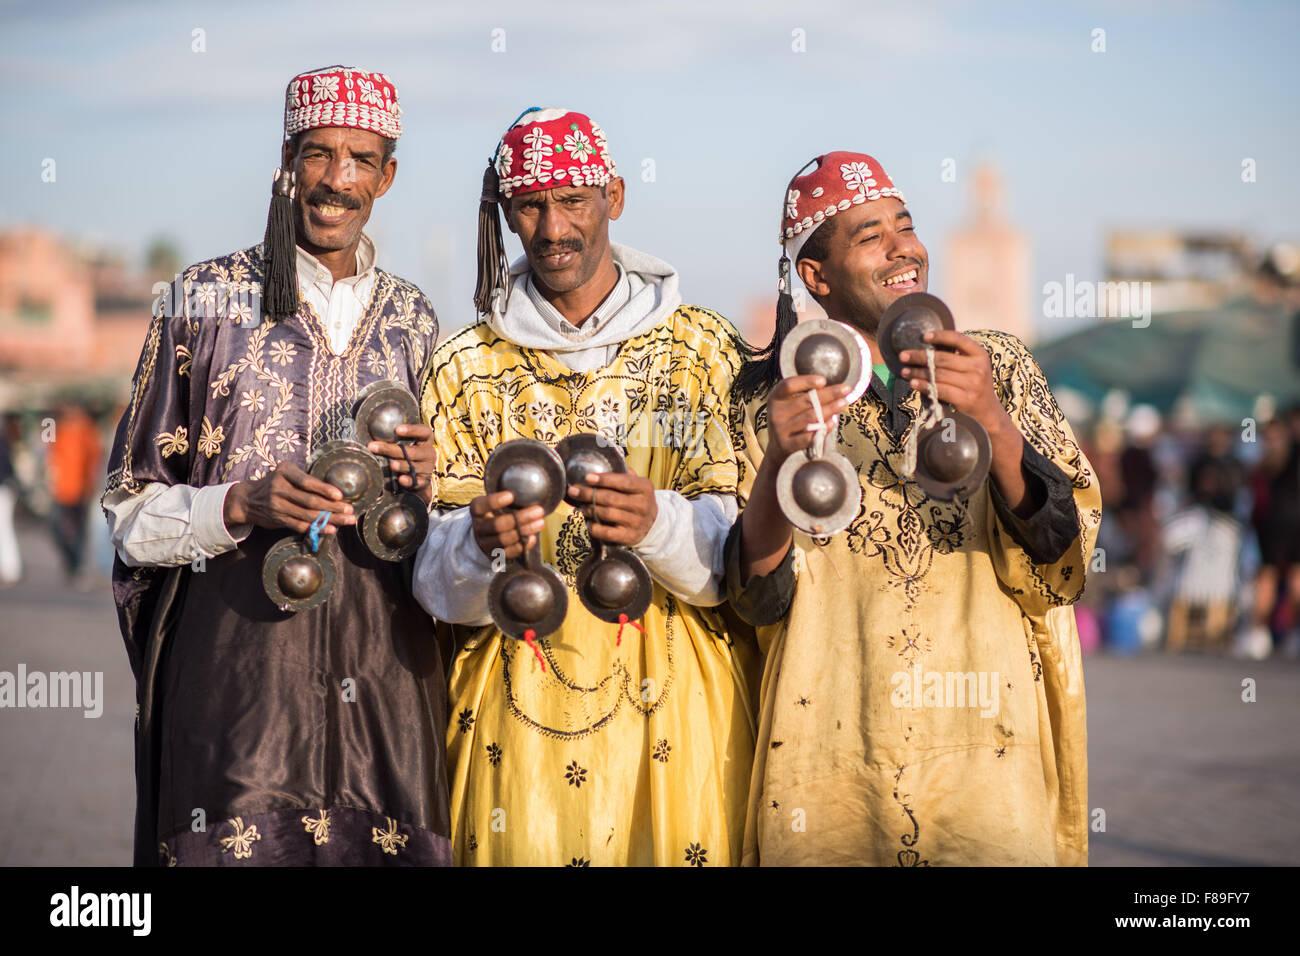 Three Gnawa musicians in traditional dress performing at Jemaa el-Fnaa in Marrakesh Stock Photo